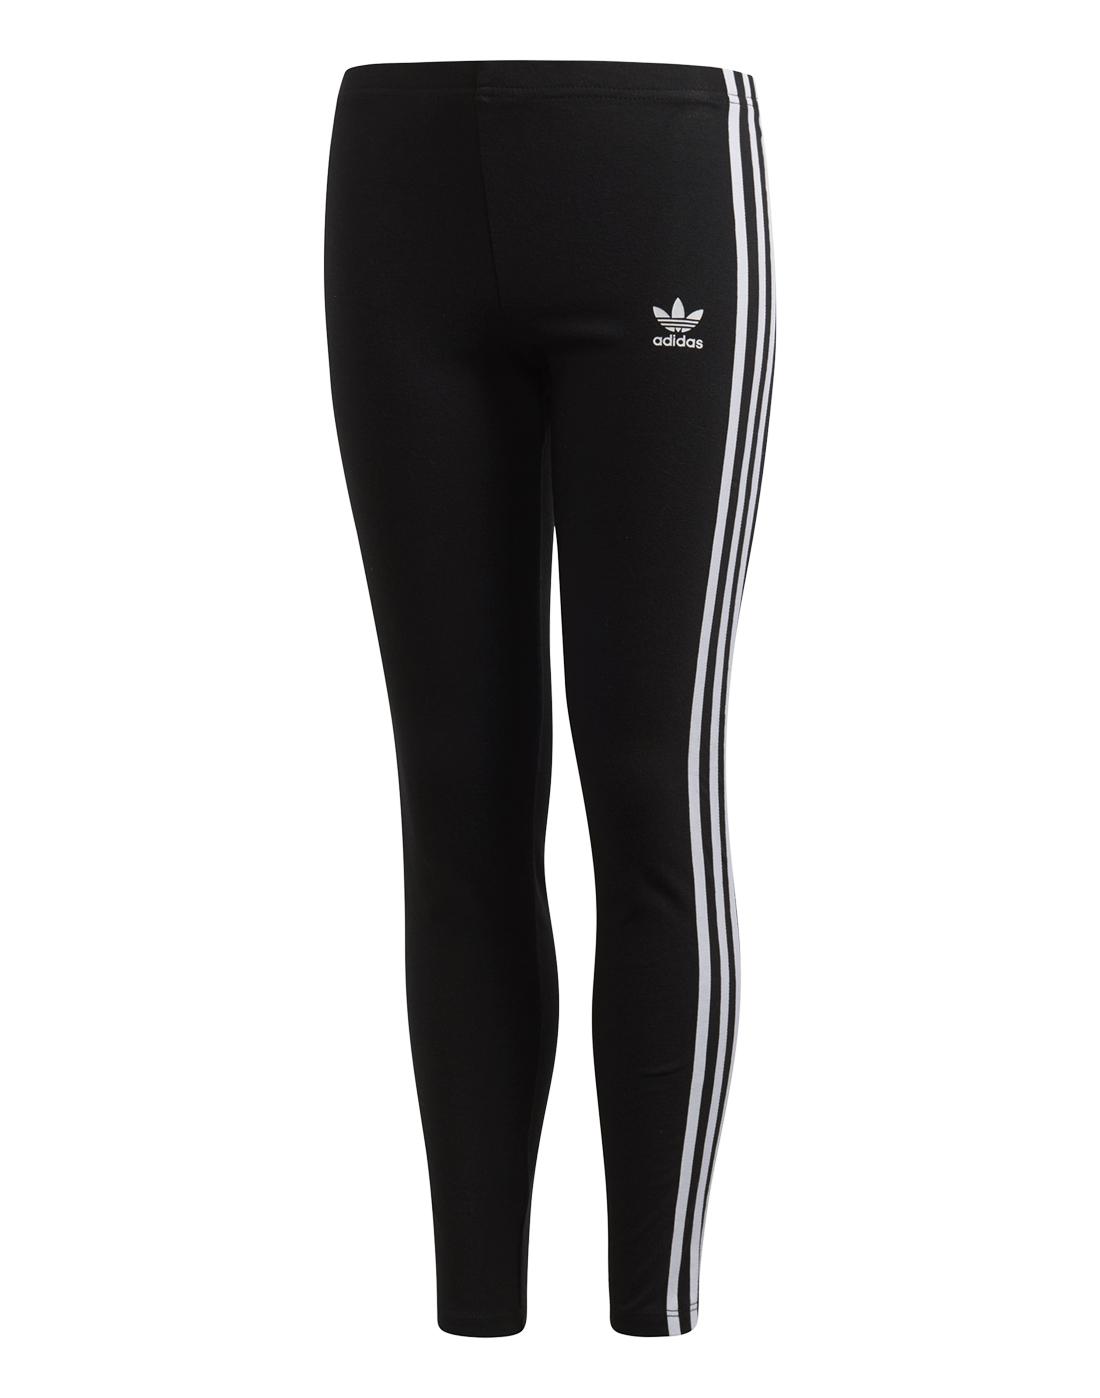 6a5139f45 Older Girls adidas Originals 3-Stripe Leggings | Black | Life Style ...